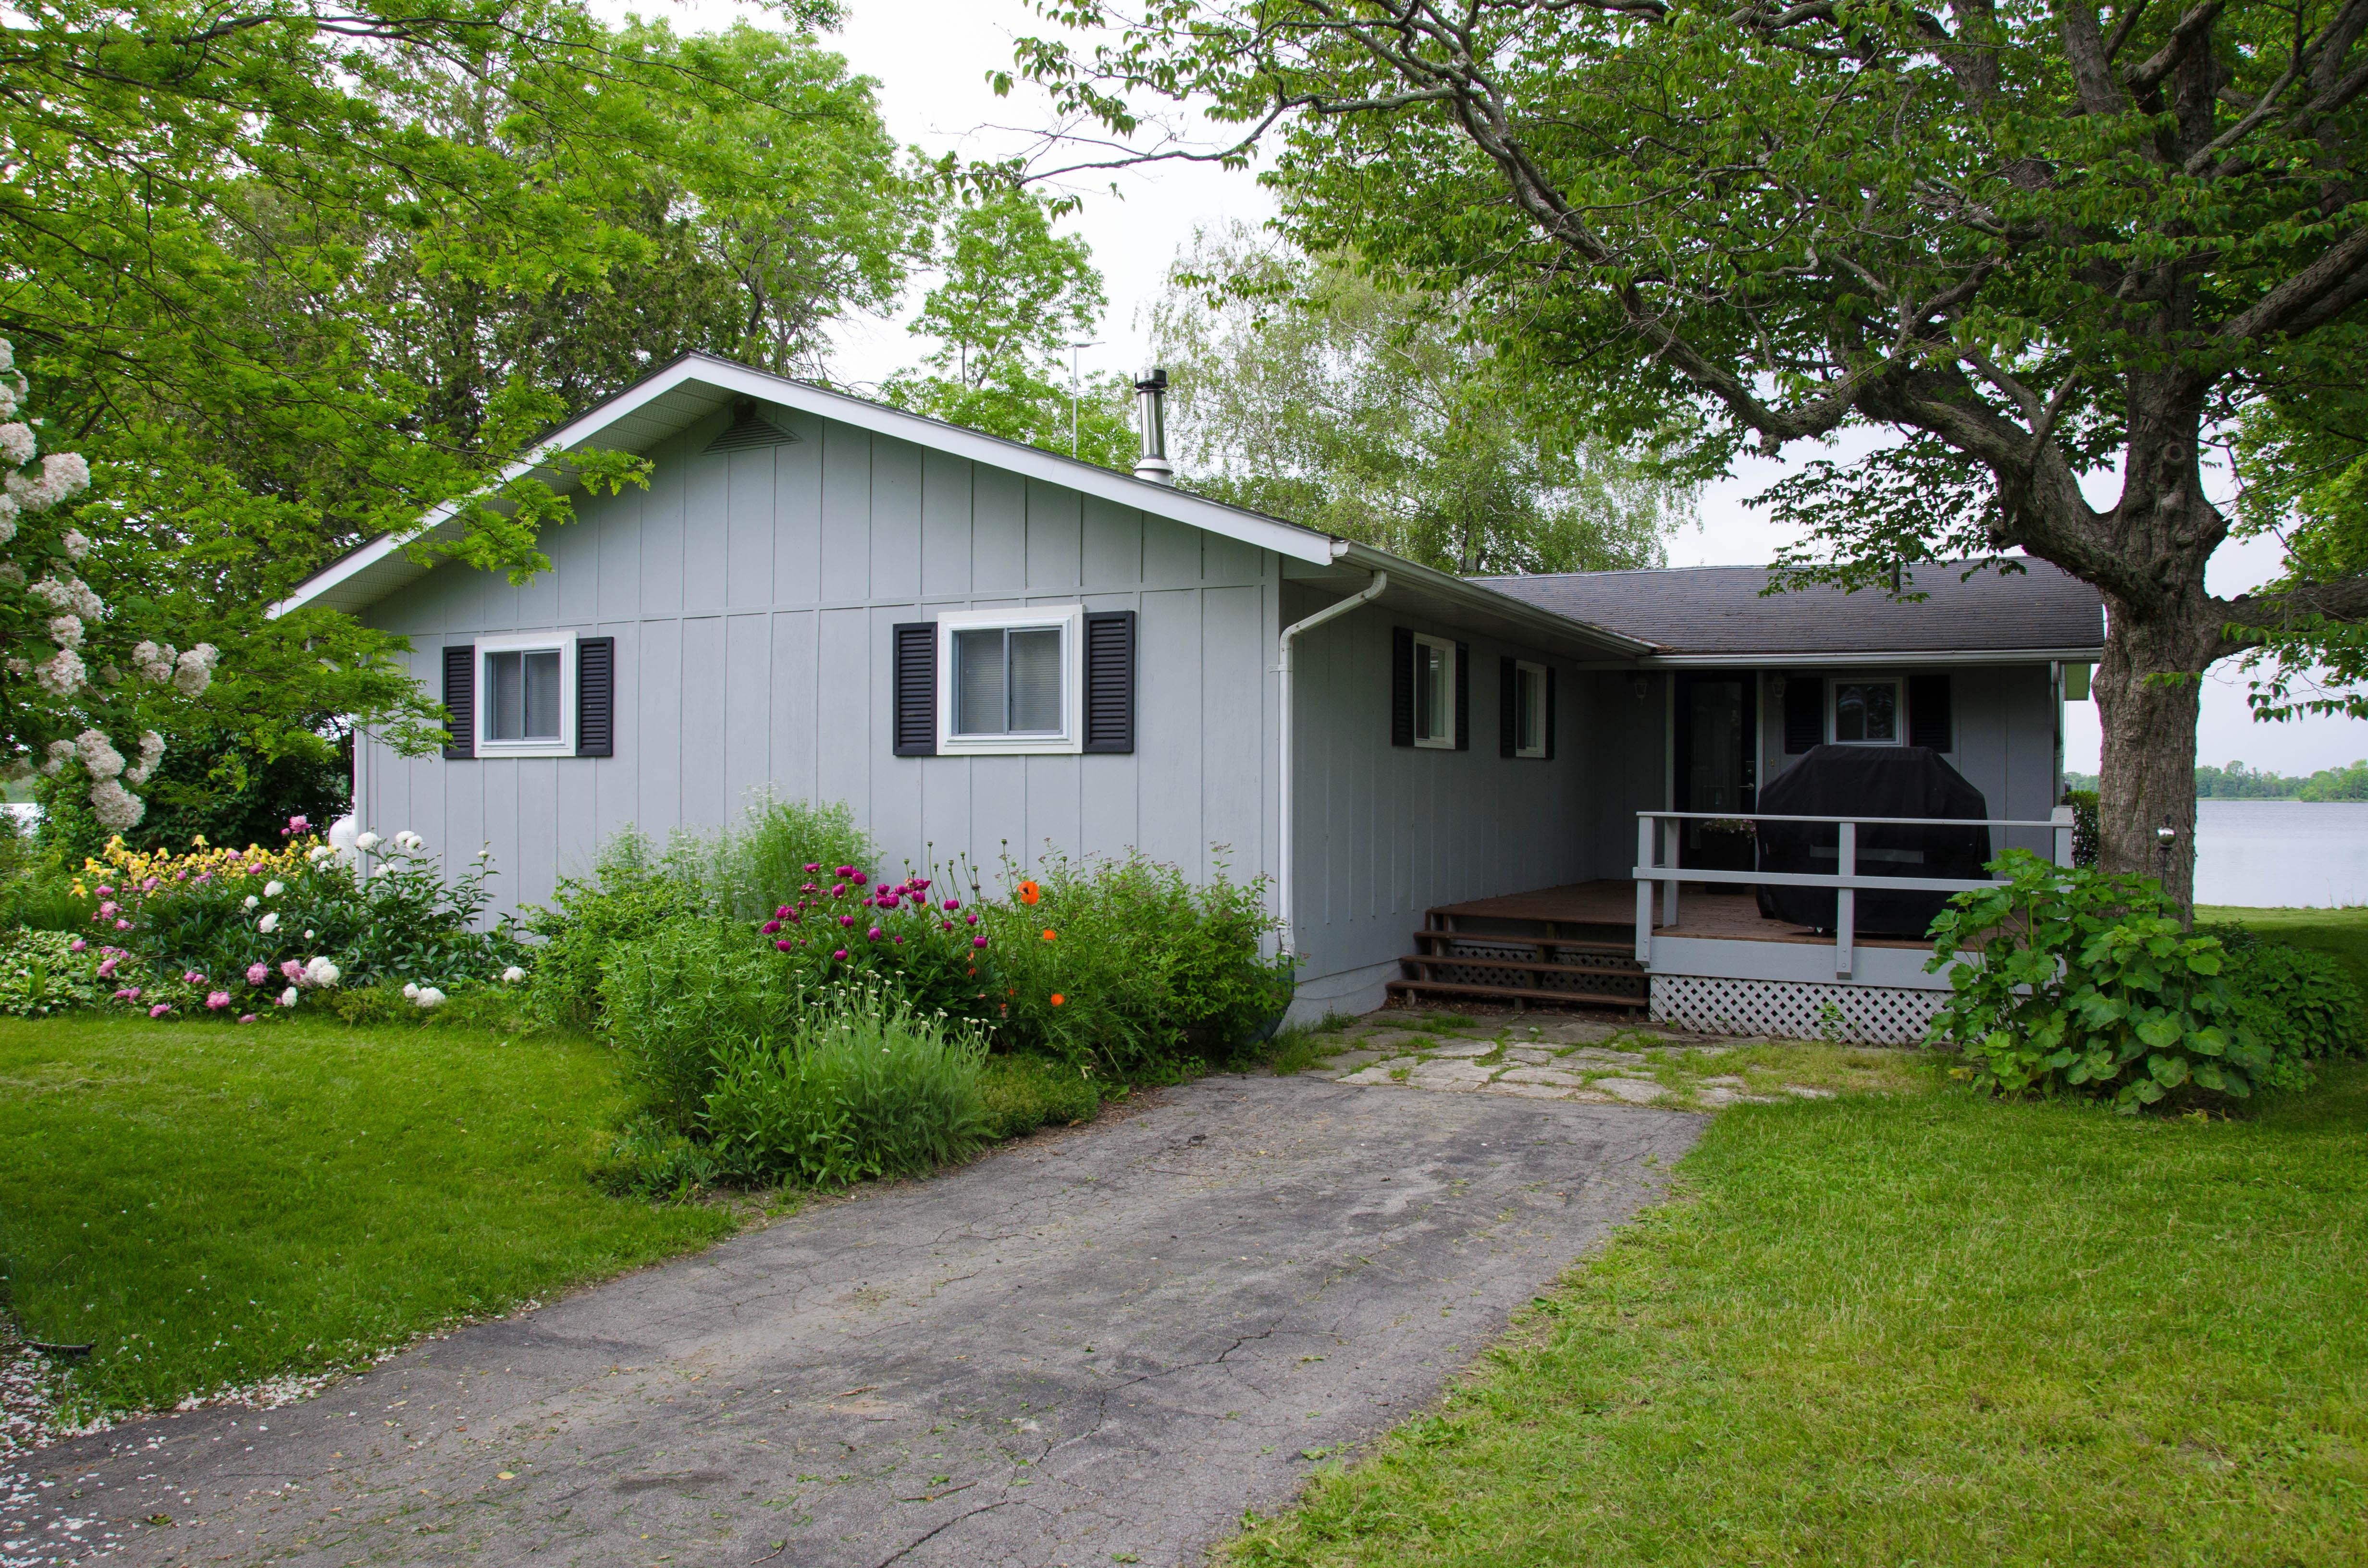 Prince edward county cottage rental entrance